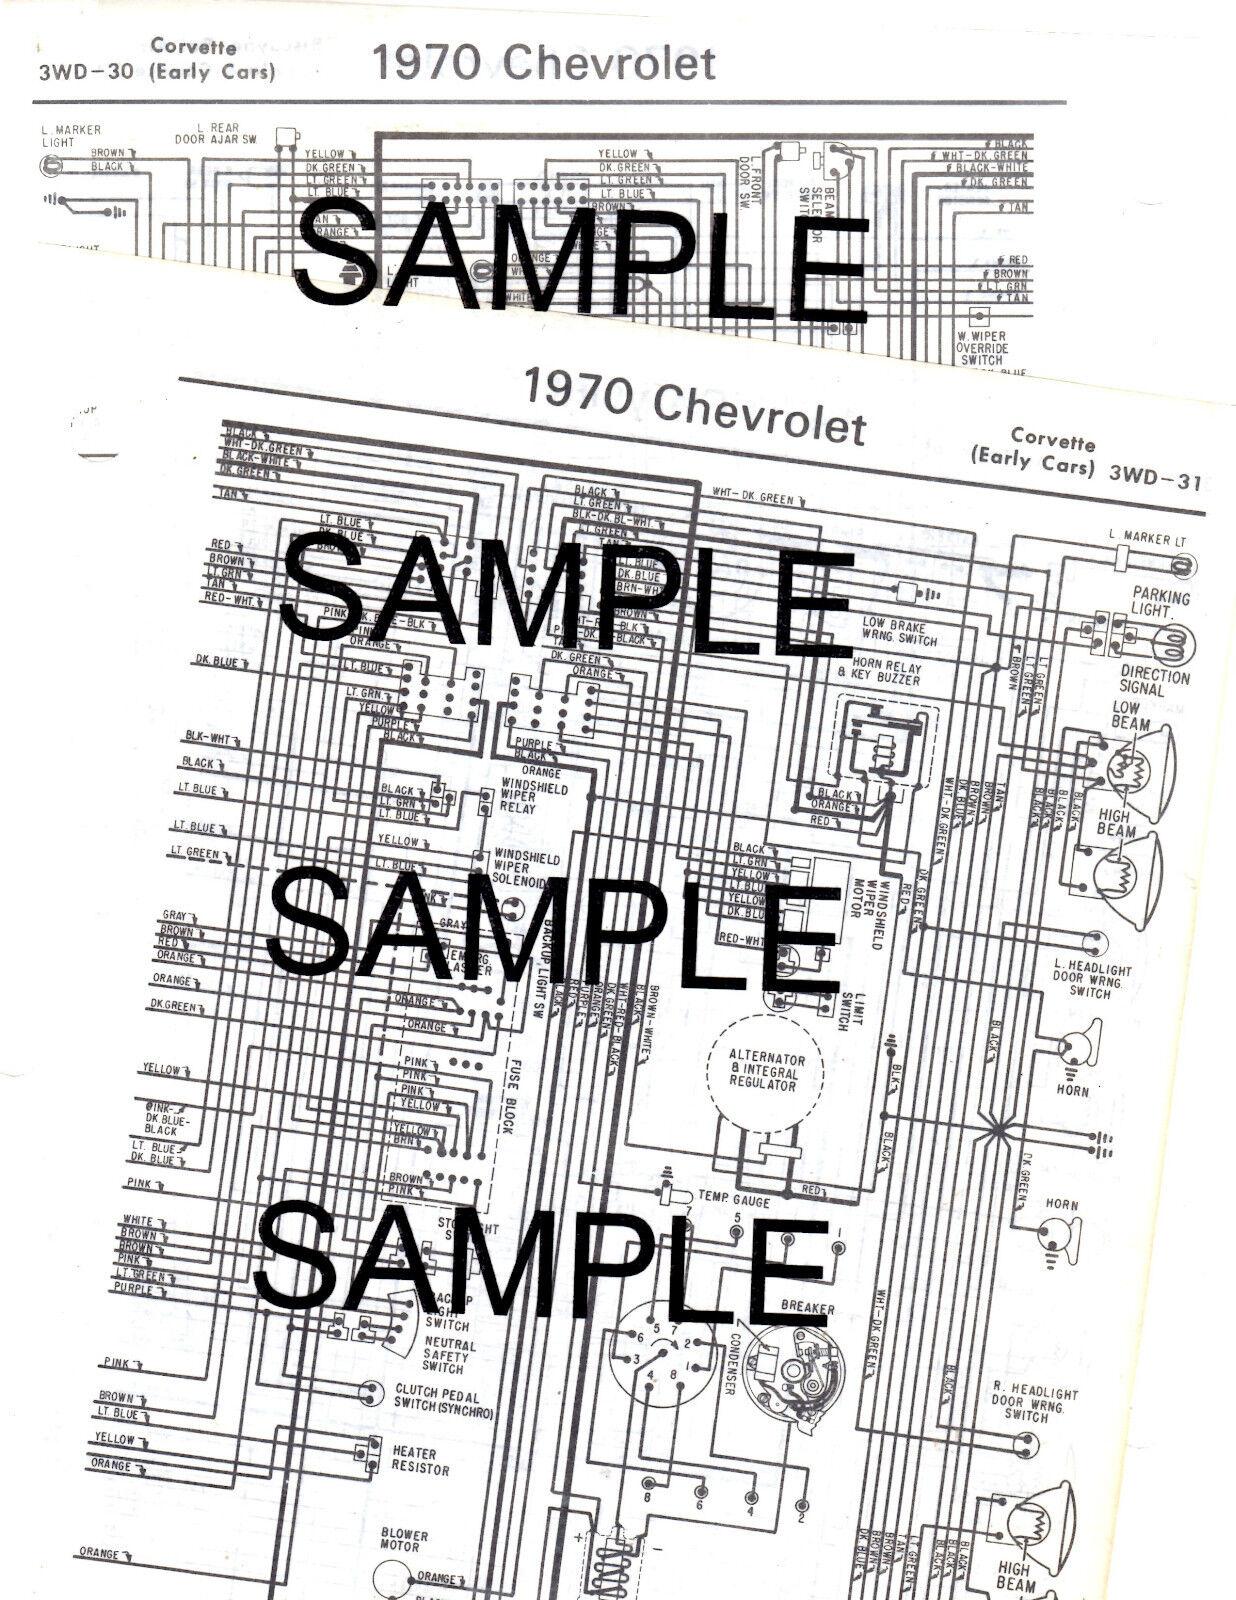 1975 camaro wiring diagram xcqn oxnanospin uk \u2022 1968 Camaro Ignition Wiring Diagram 1975 camaro wiring diagram design library